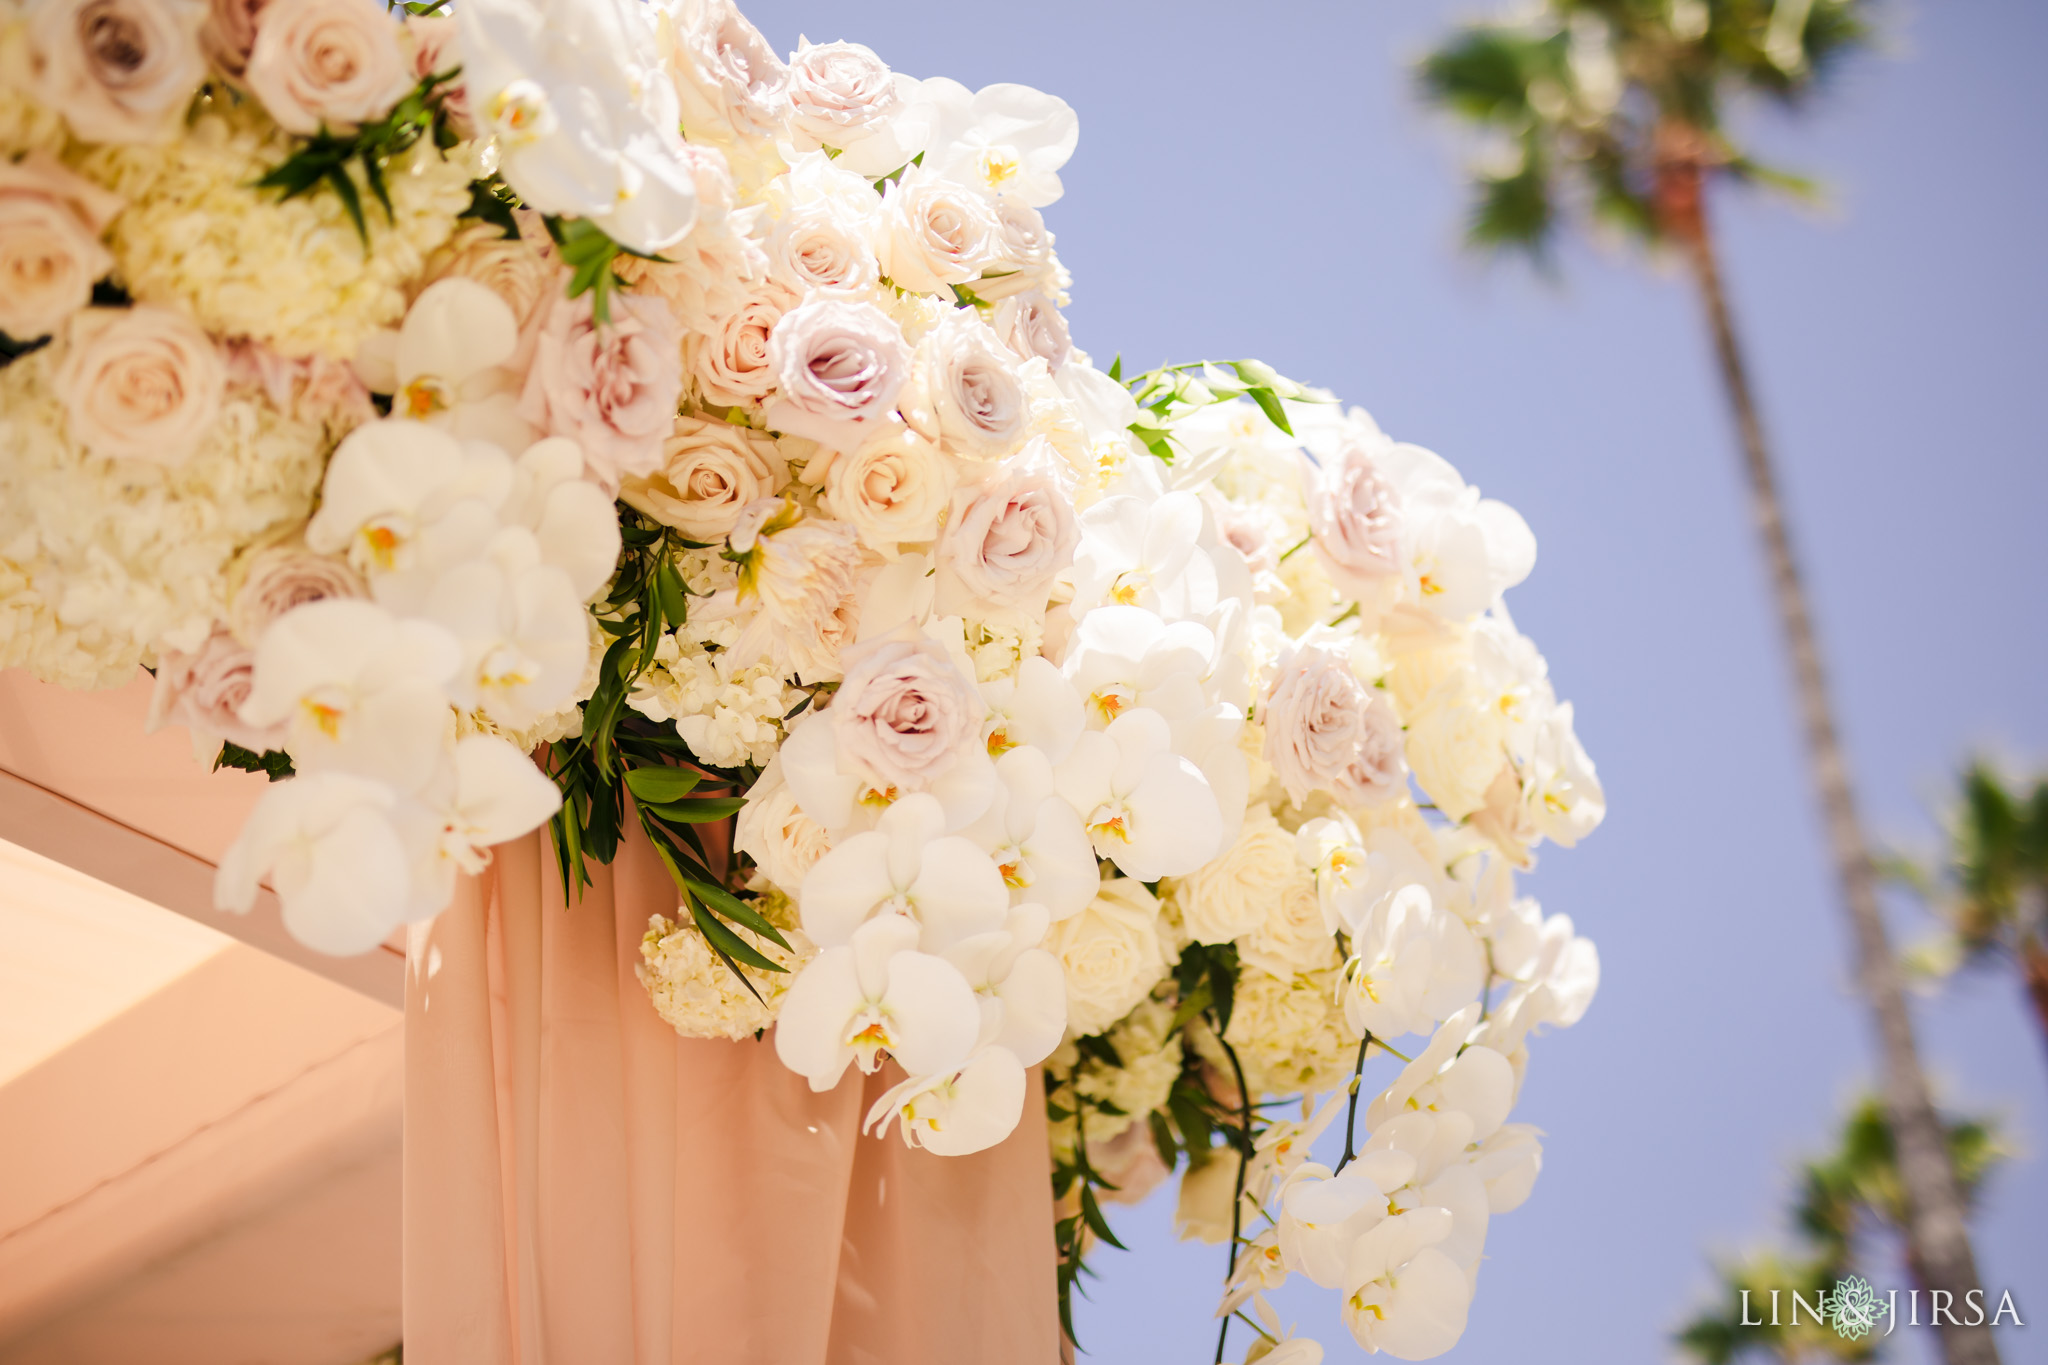 08-ritz-carlton-laguna-niguel-indian-wedding-photography-1.jpg